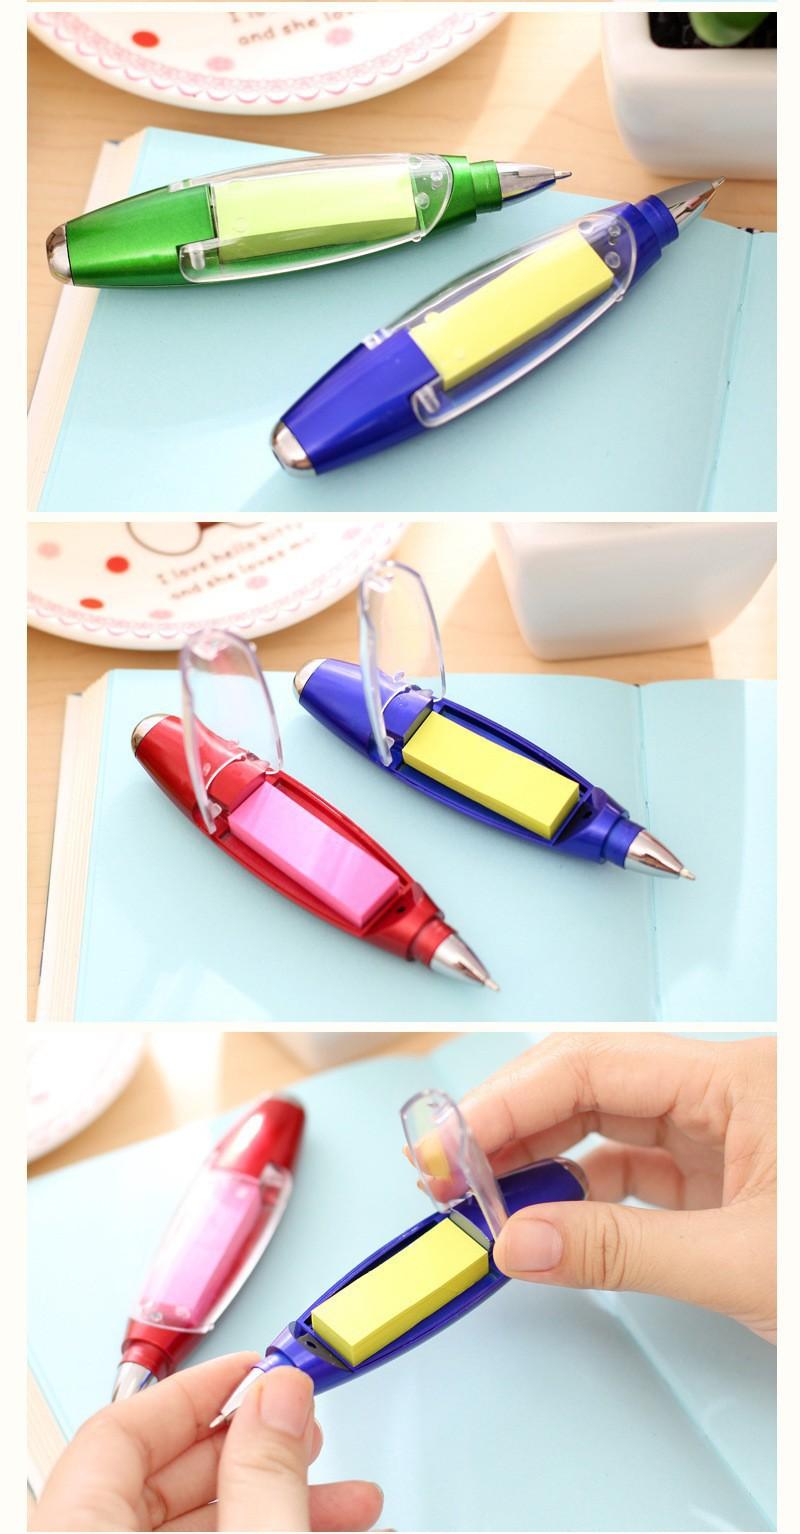 Ручка блокнот с фонариком ручка шпаргалка с бумагой внутри 17 - Ручка-блокнот с фонариком, ручка-шпаргалка с бумагой внутри